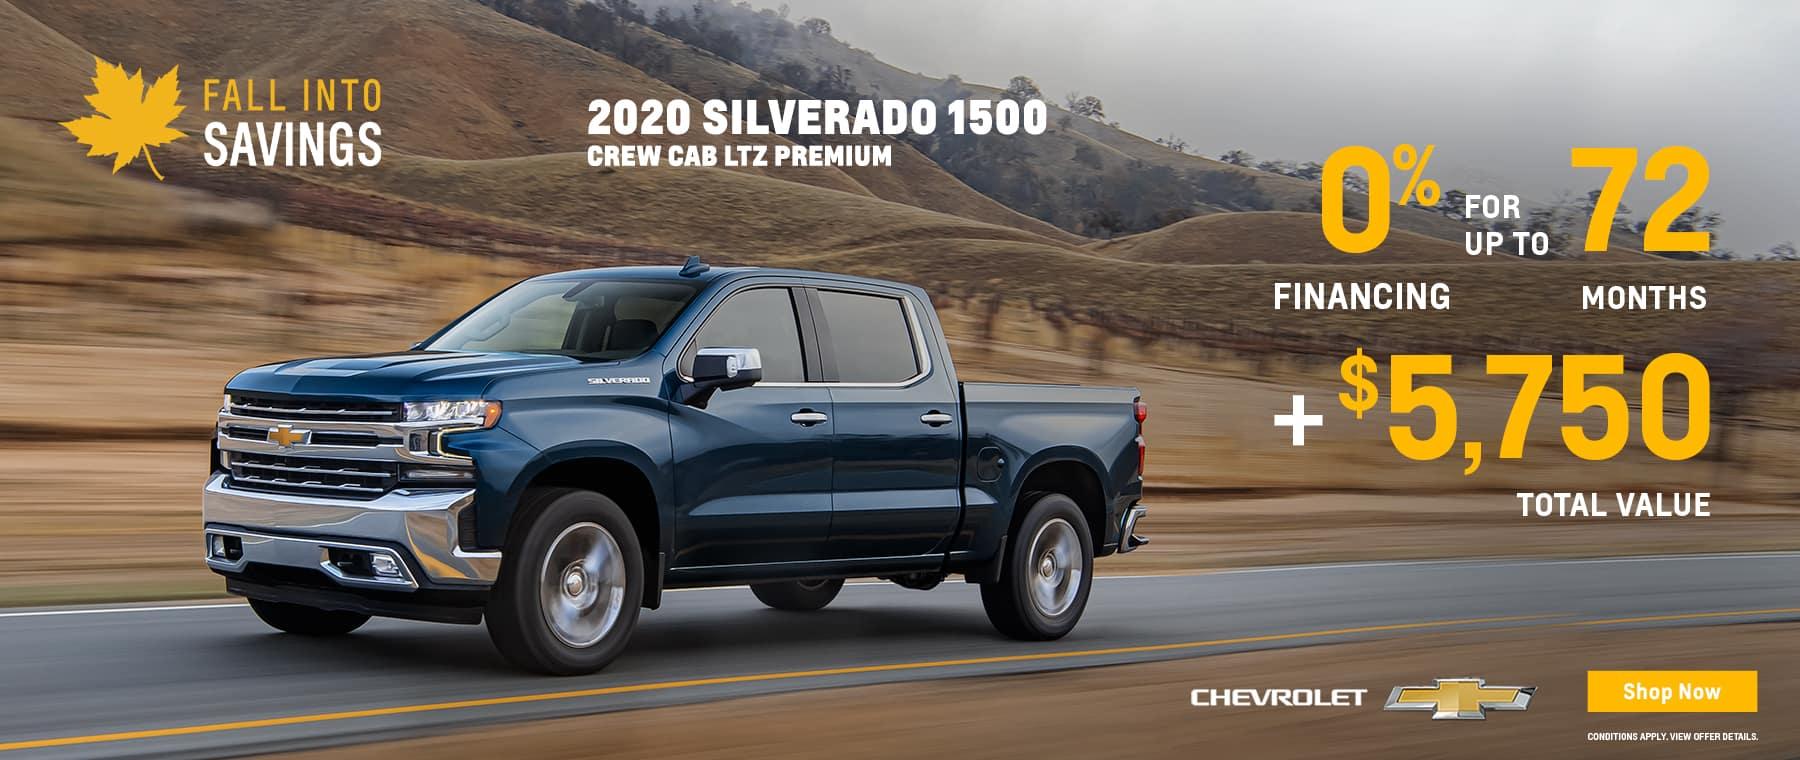 2020_SEP_WST_Silverado_T3_EN_1800x760_MULTI_v2